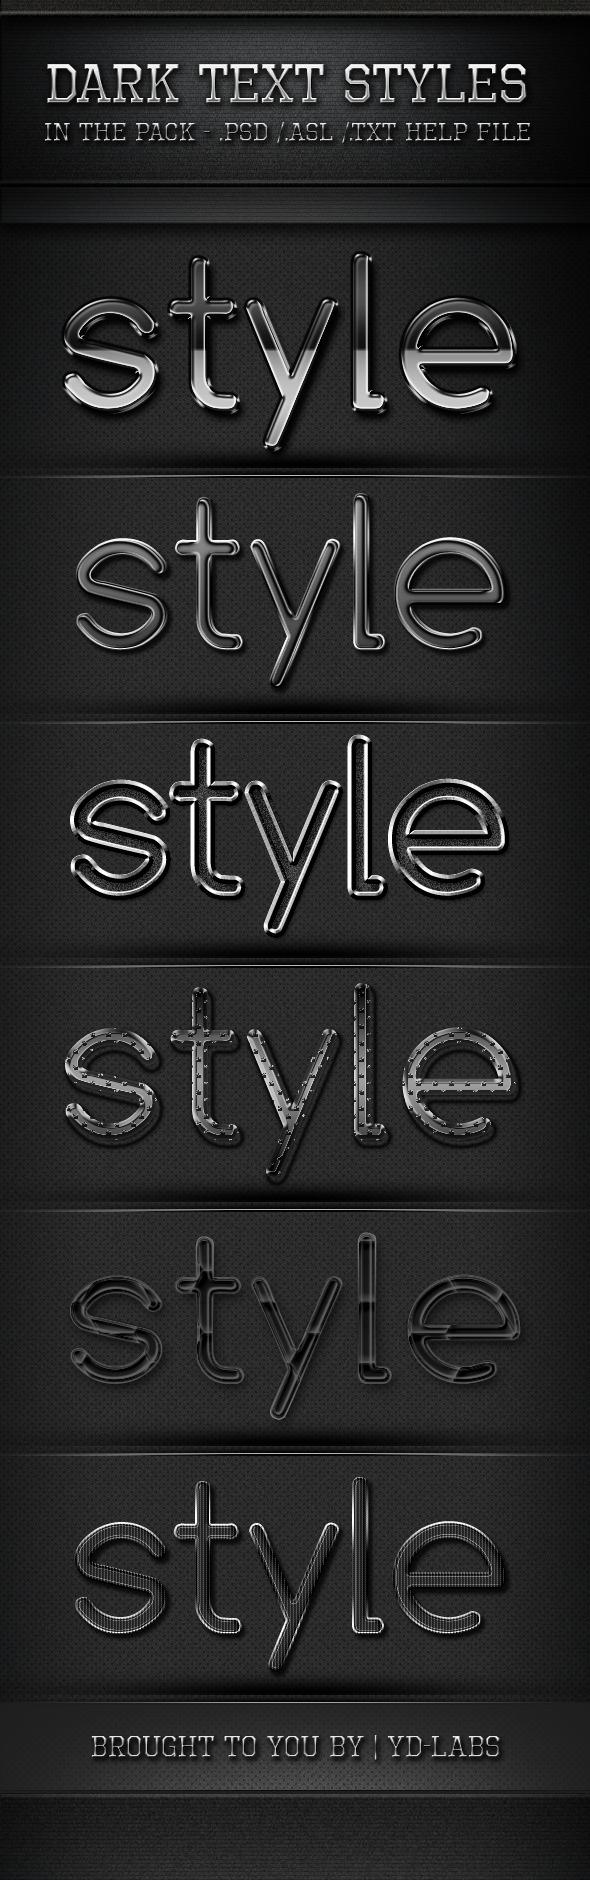 Dark Text Styles - Photoshop Add-ons